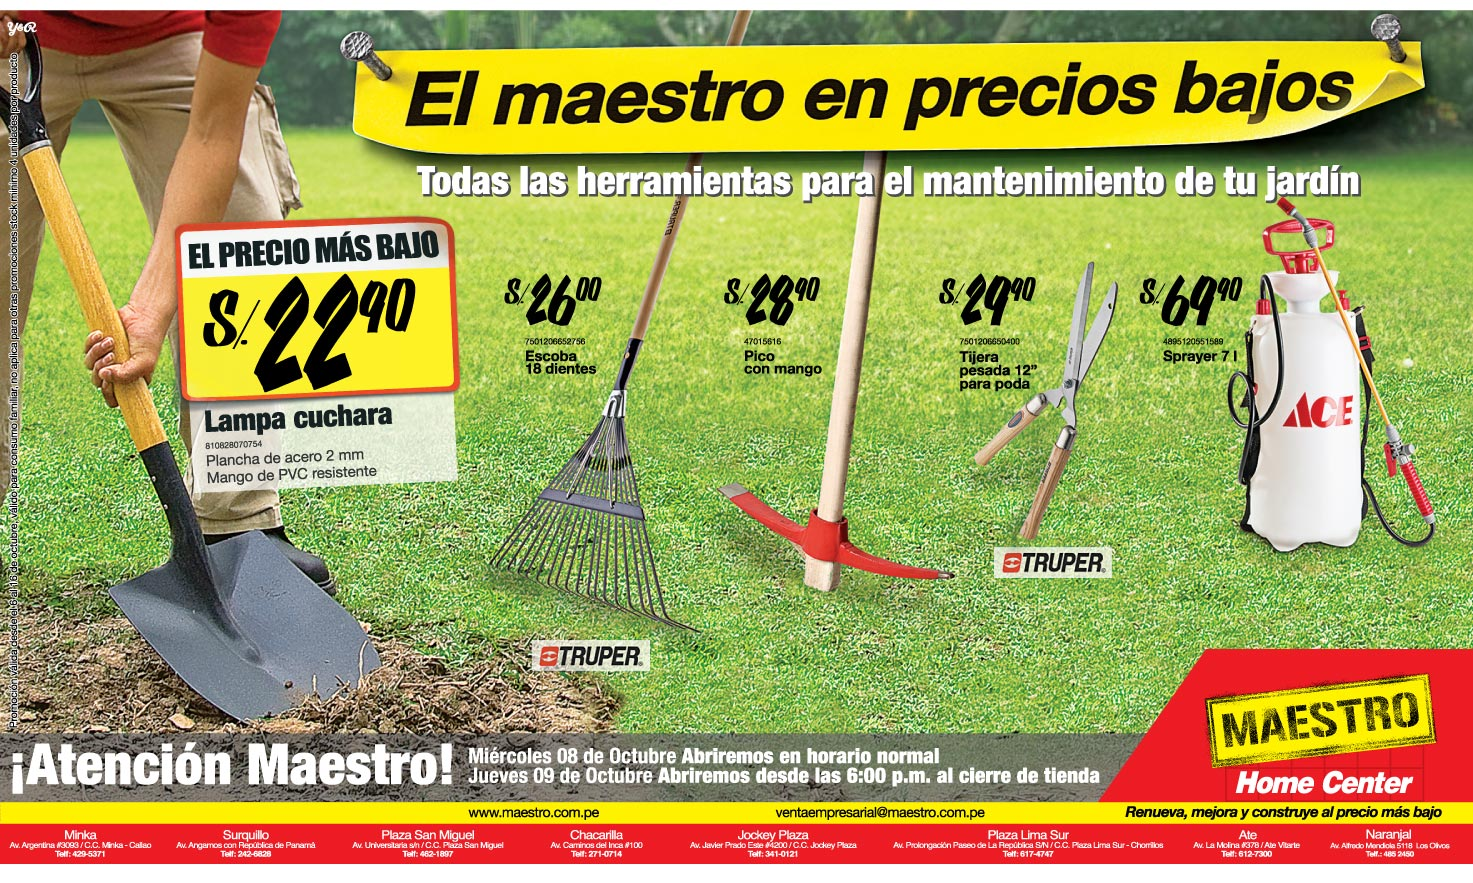 Eufrateadas aviso herramientas de jardiner a - Herramientas de jardineria 94 ...